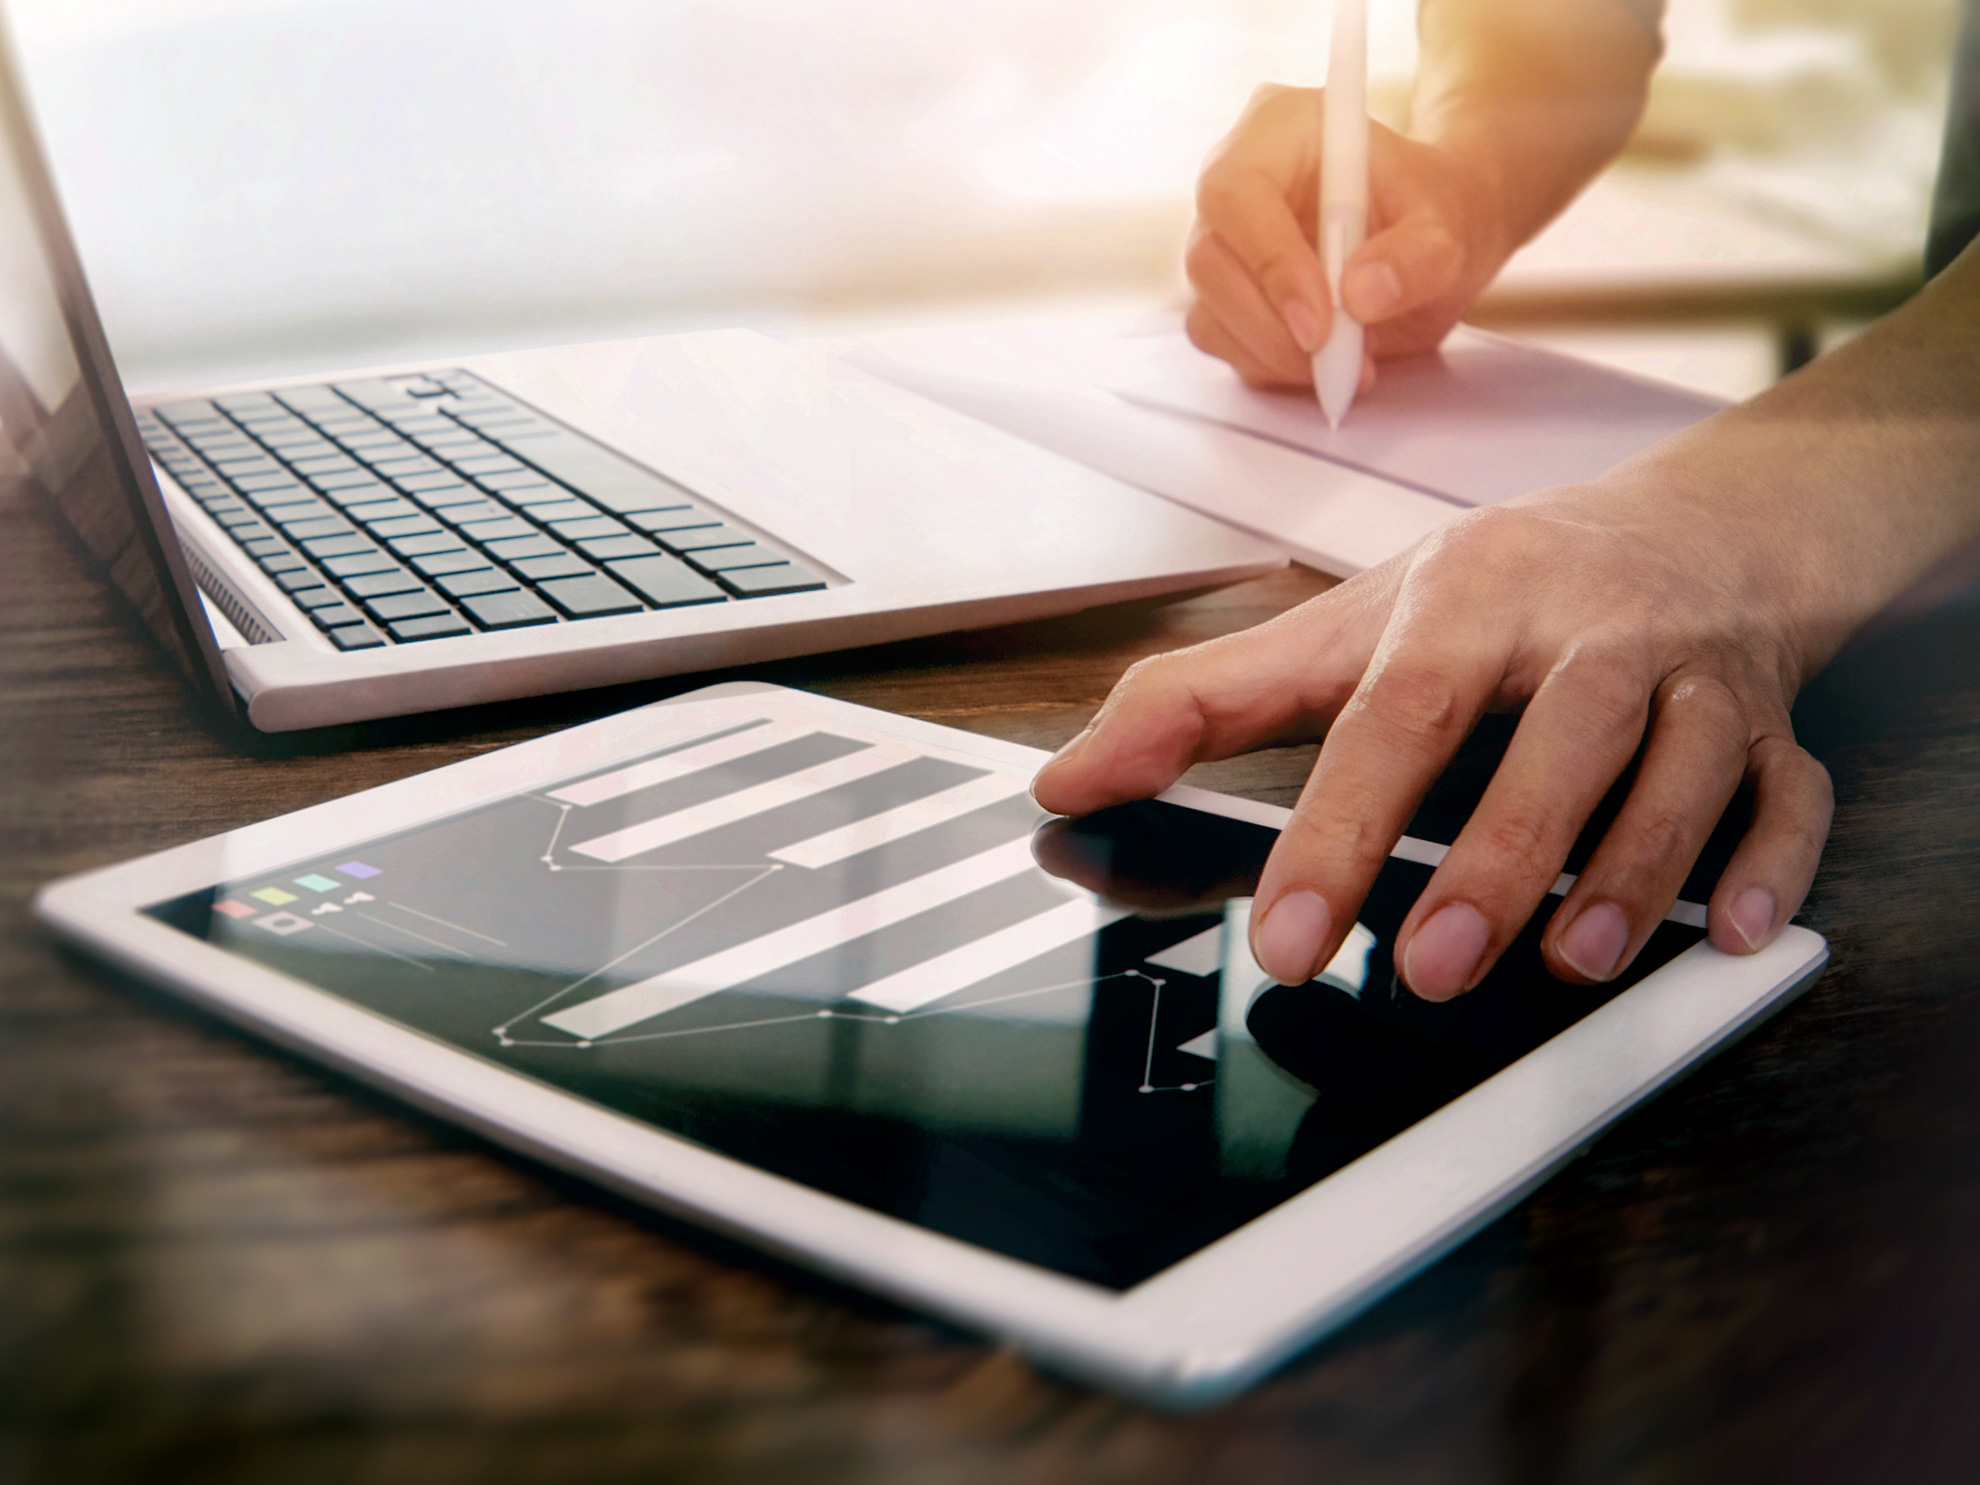 tablet-business-intelligence